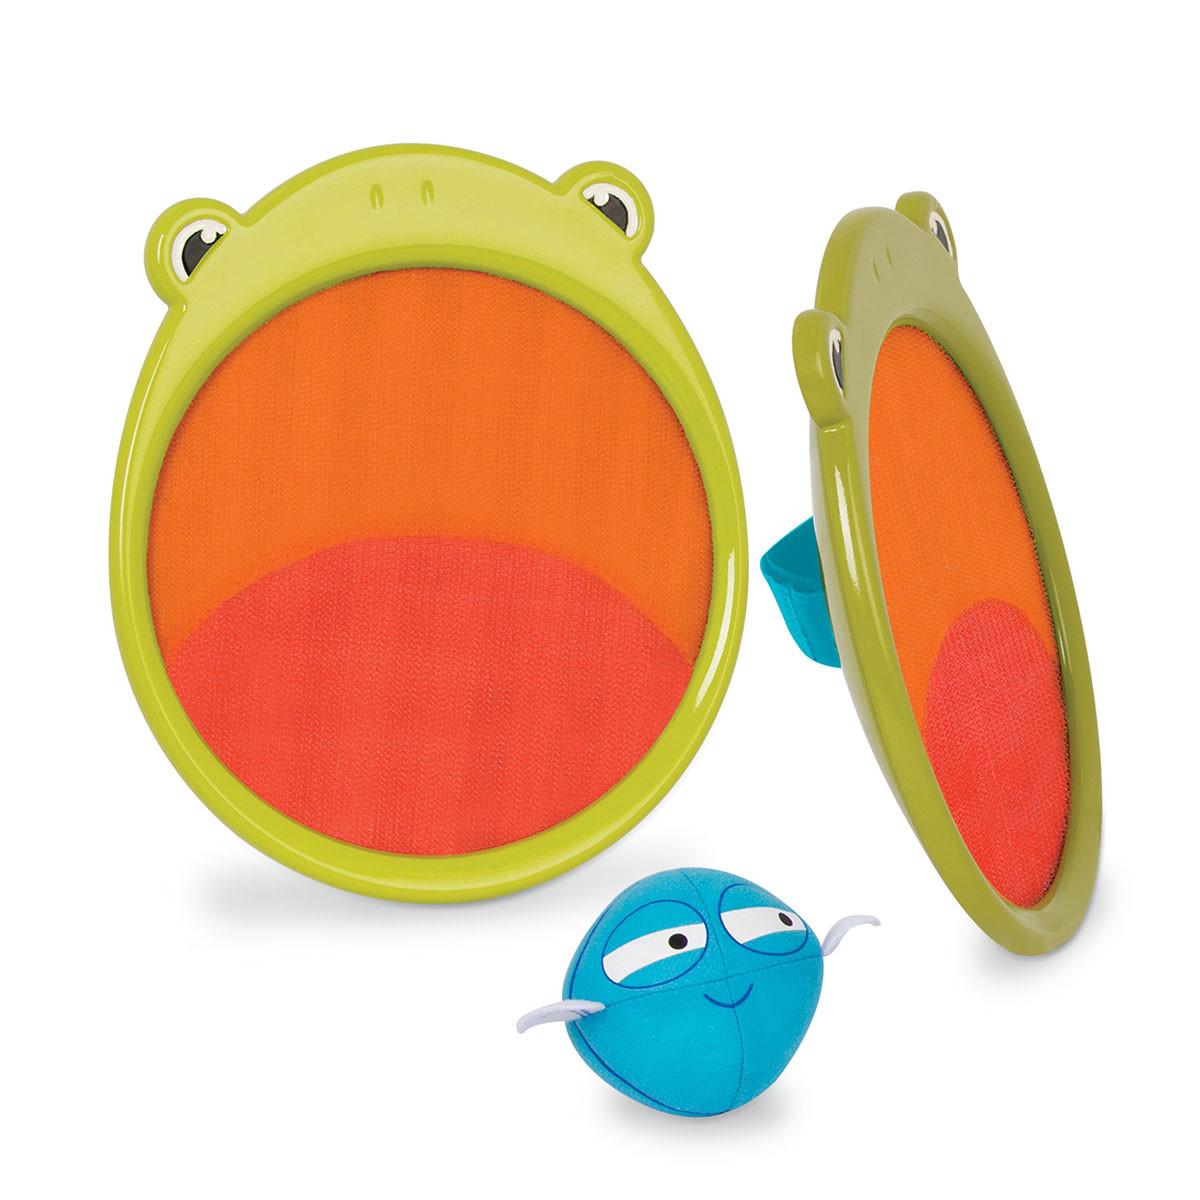 Развивающая Игра - Лягушки-Ловушки Battat Critter Catchers Frankie The Frog BX1554Z